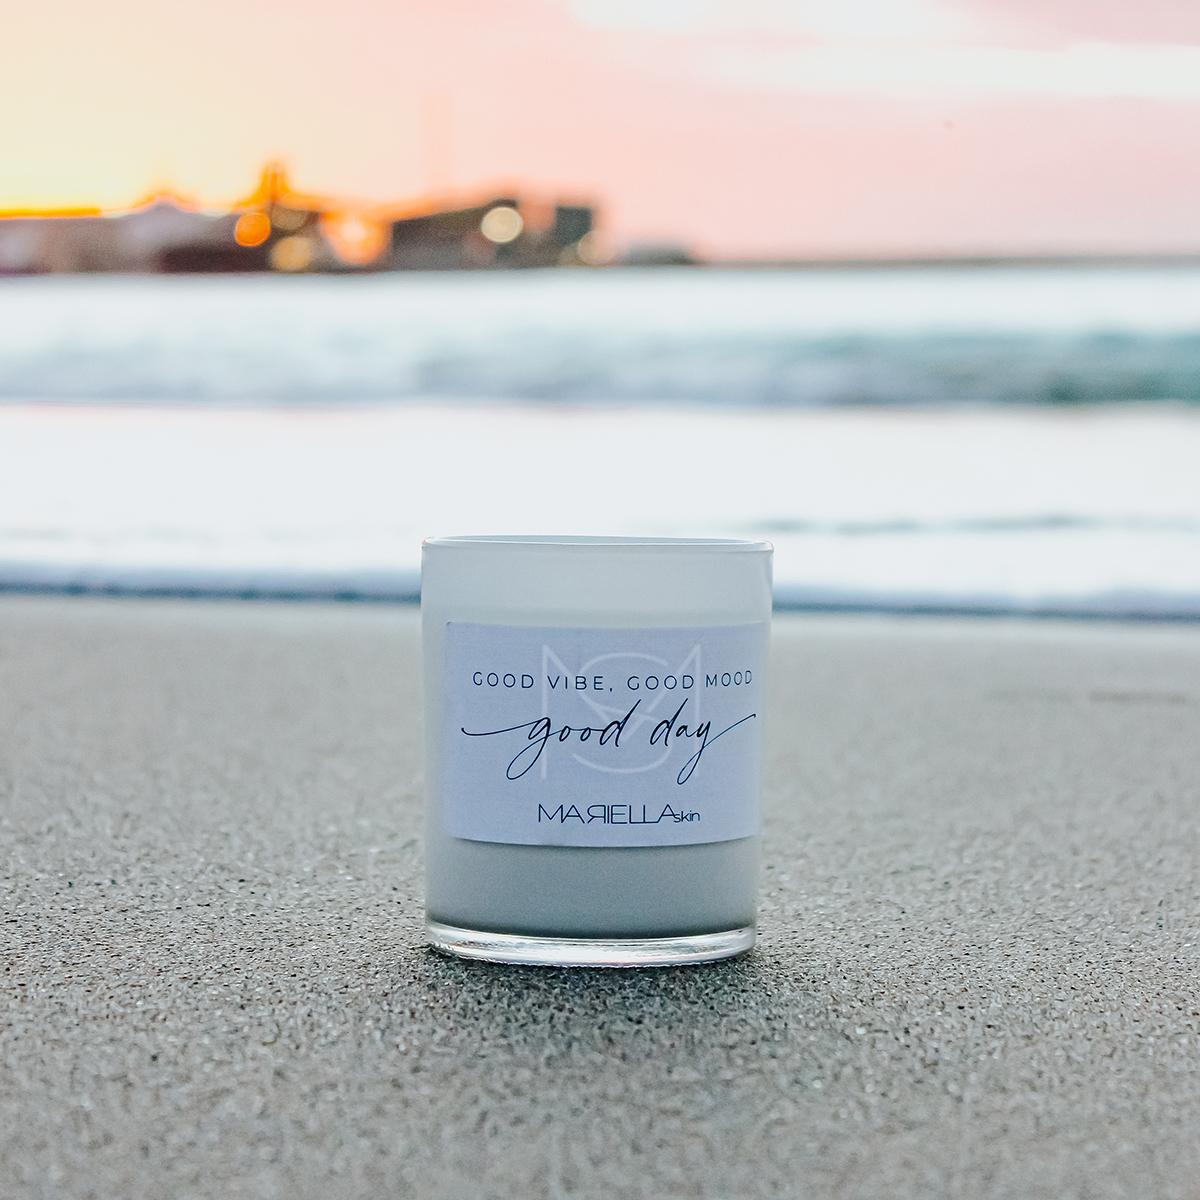 Glow Getter Candle - Mariella Skin Perth WA